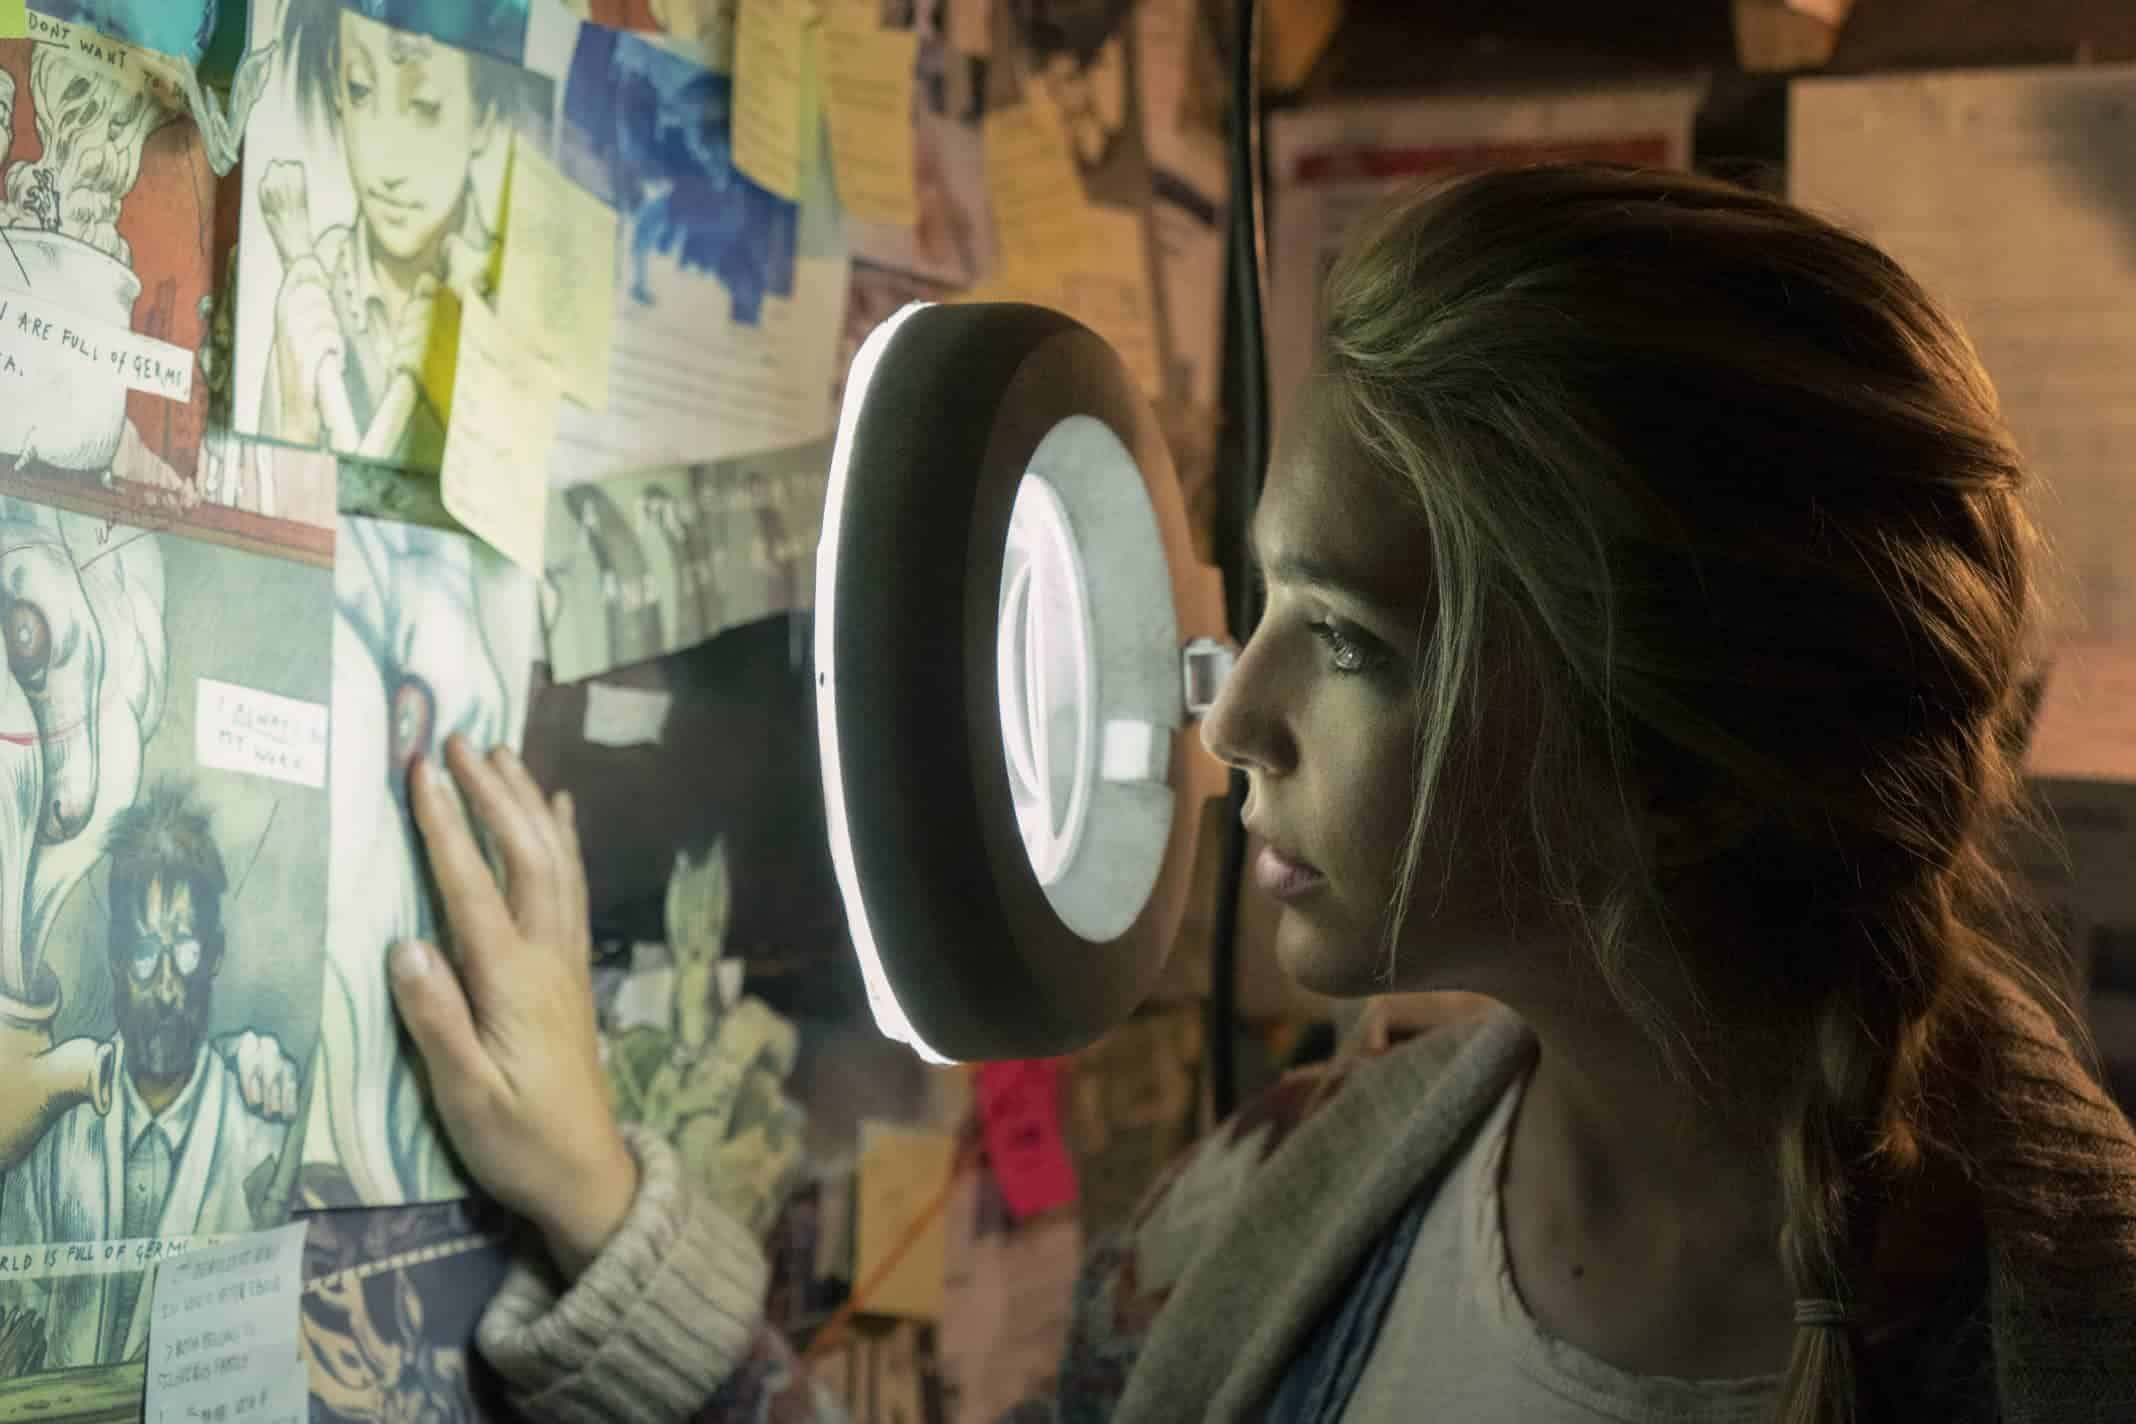 Samantha (Jessica Rothe) looking at Wilson Wilson's Utopia comics spread across the wall.